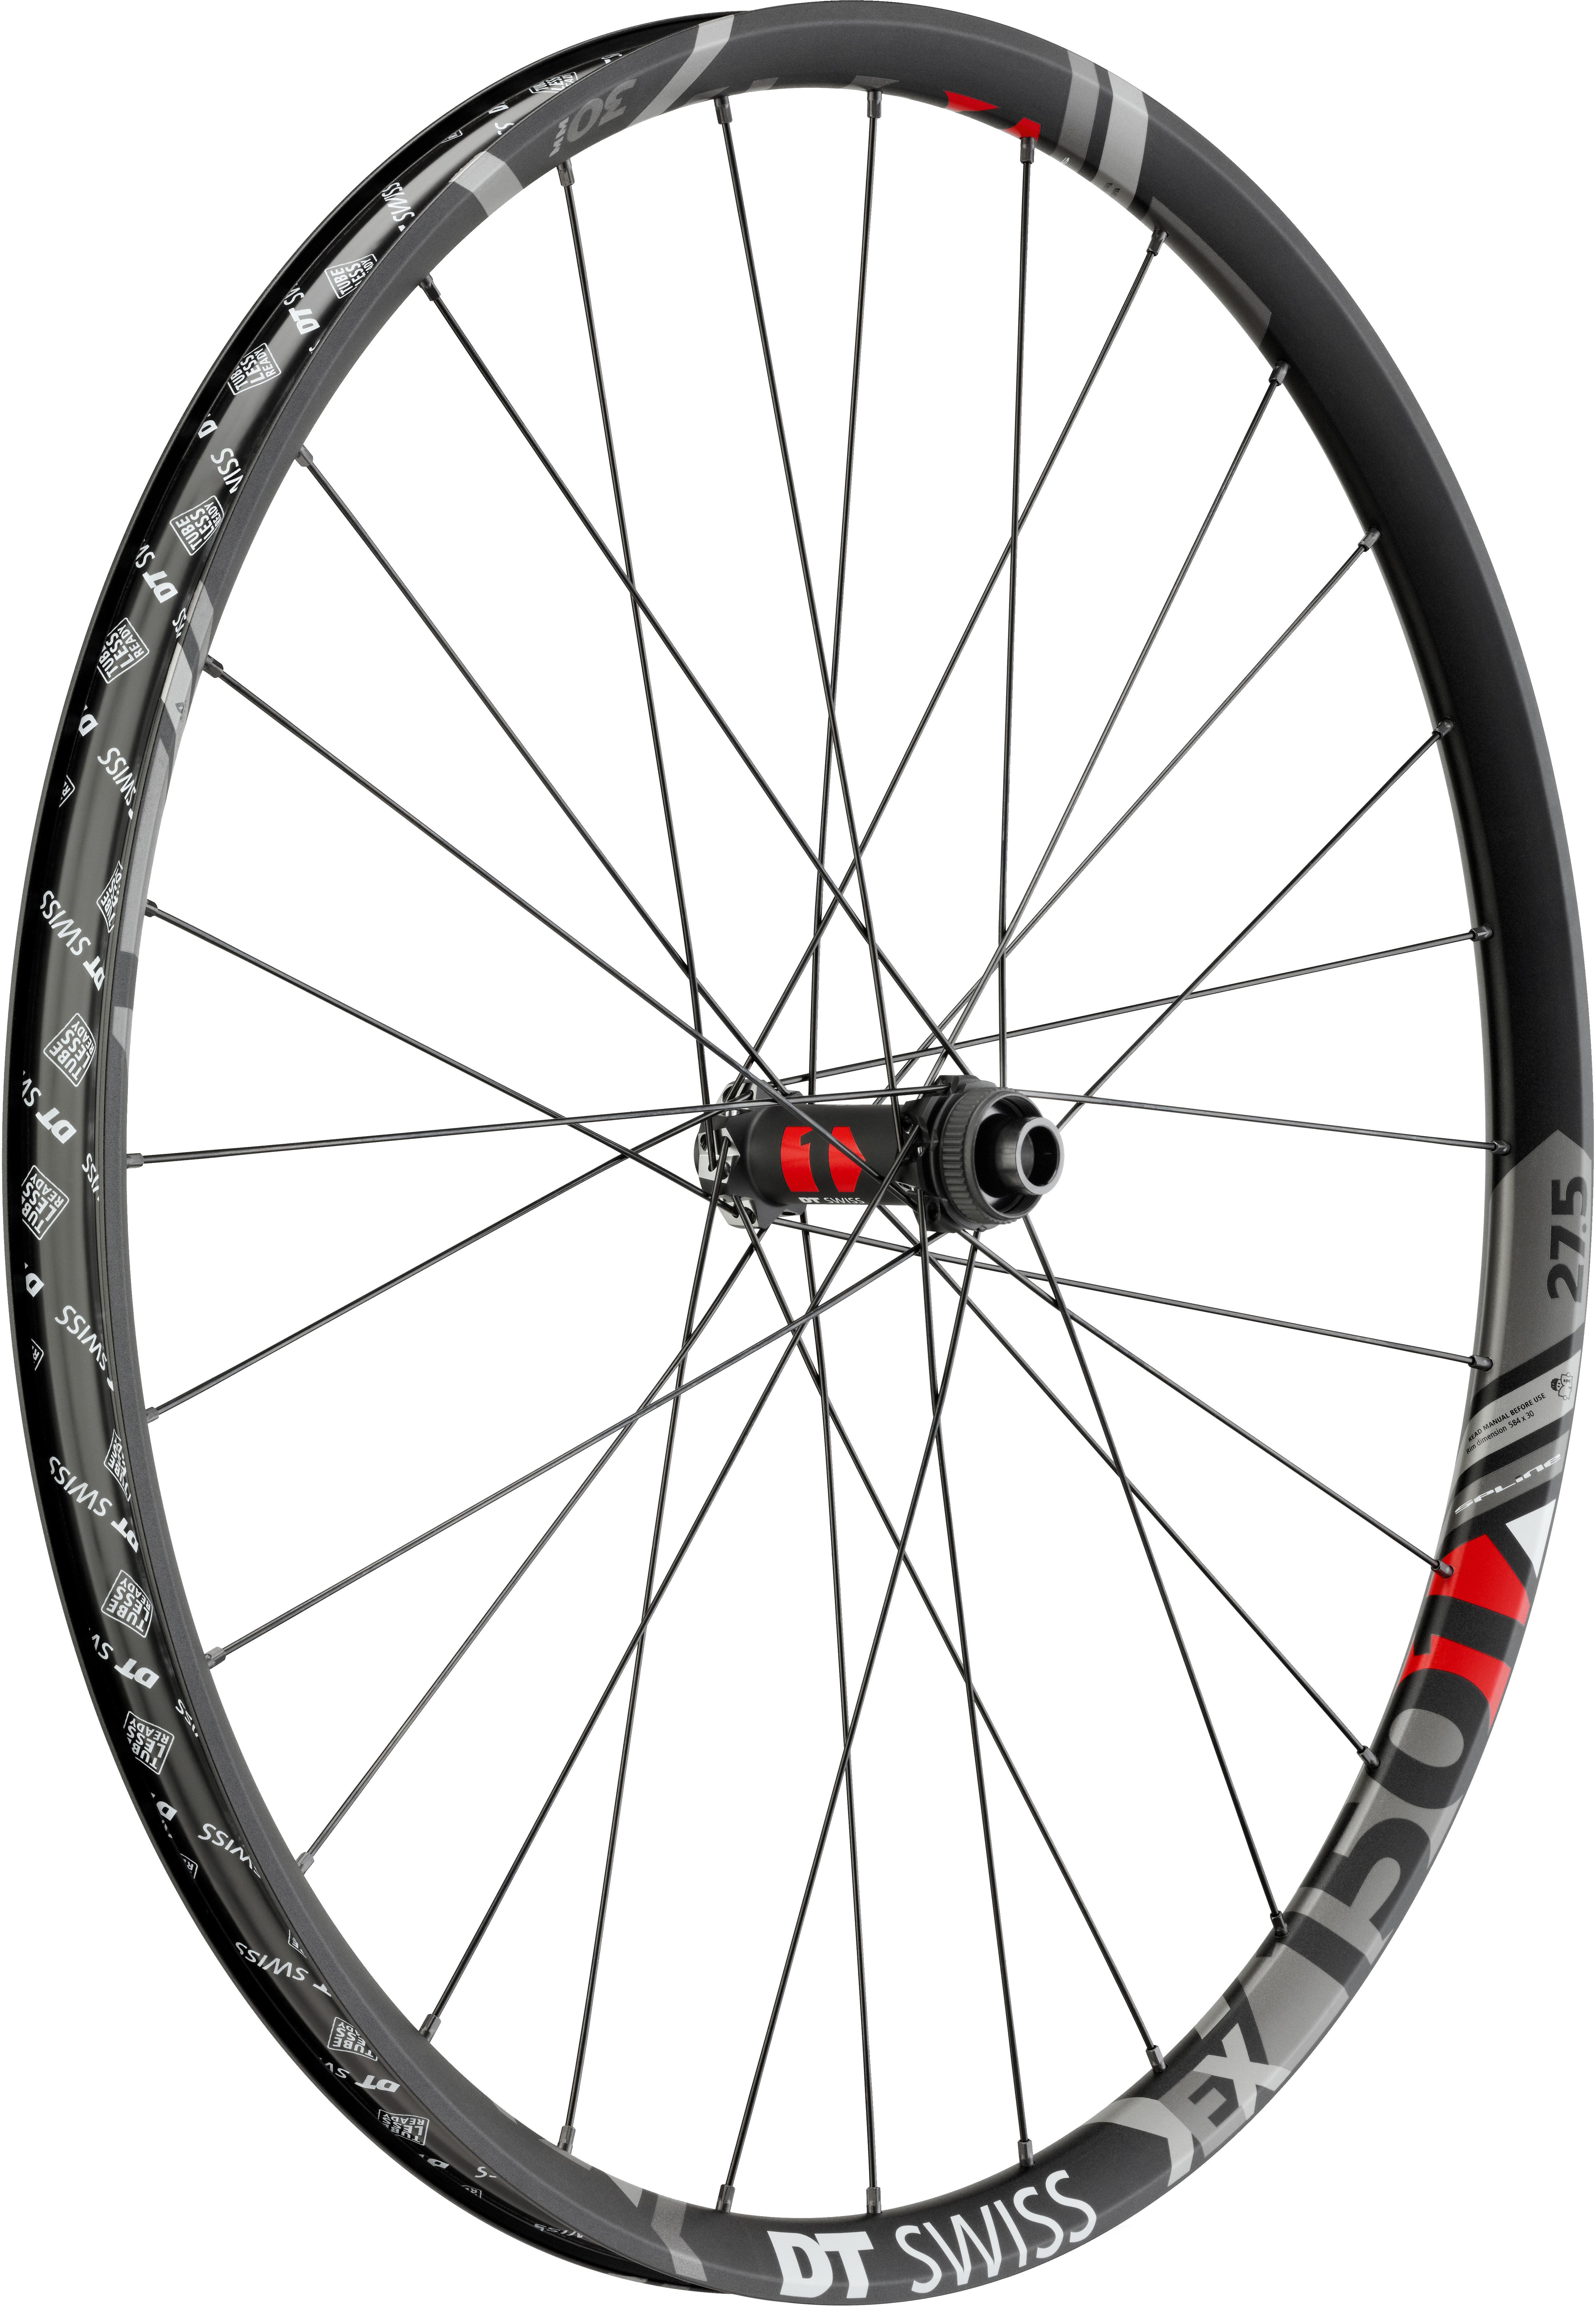 DT Swiss EX 1501 Spline One 25 27.5 Front Wheel 20x110mm